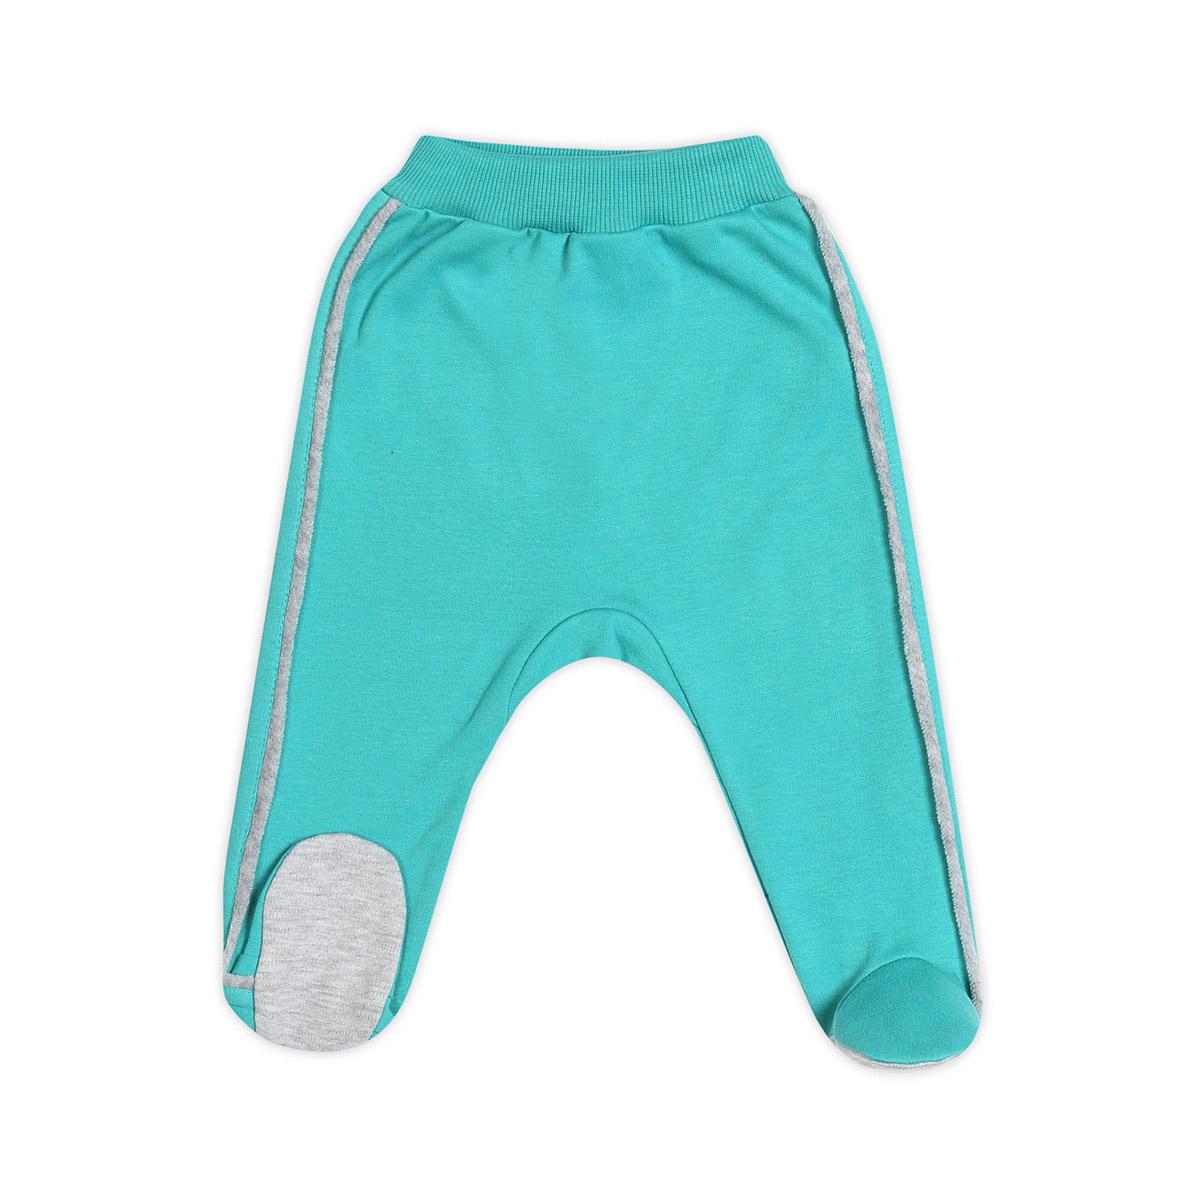 Ползунки с ножками Ёмаё Спорт (26-265) рост 80 ярко-бирюзовый<br>